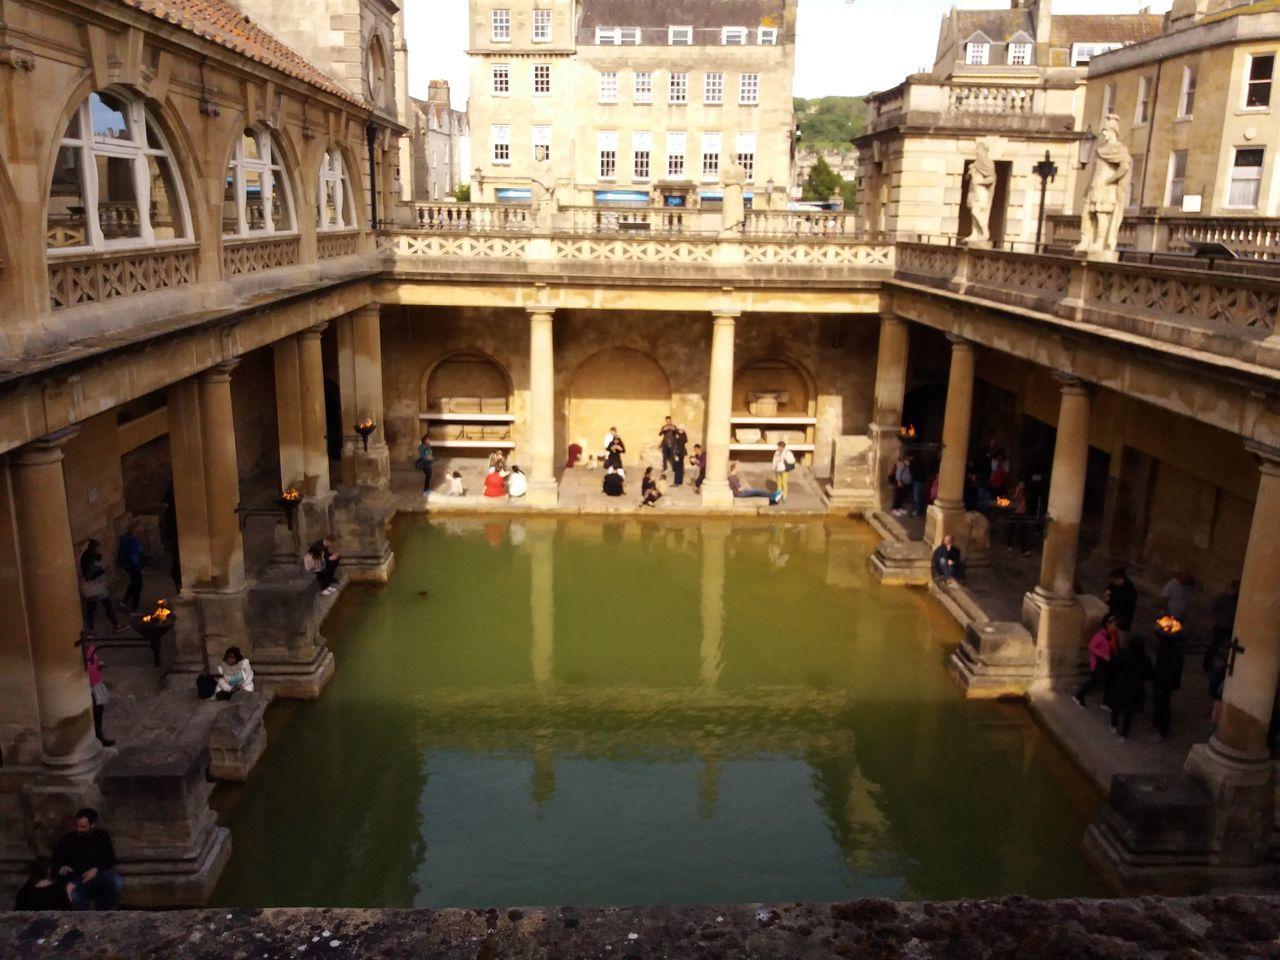 Bath Abbey  Bath, UK City Of Bath Hot Spring Hot Springs Pultney Bridge Roman Bath Roman Baths Roman Ruins